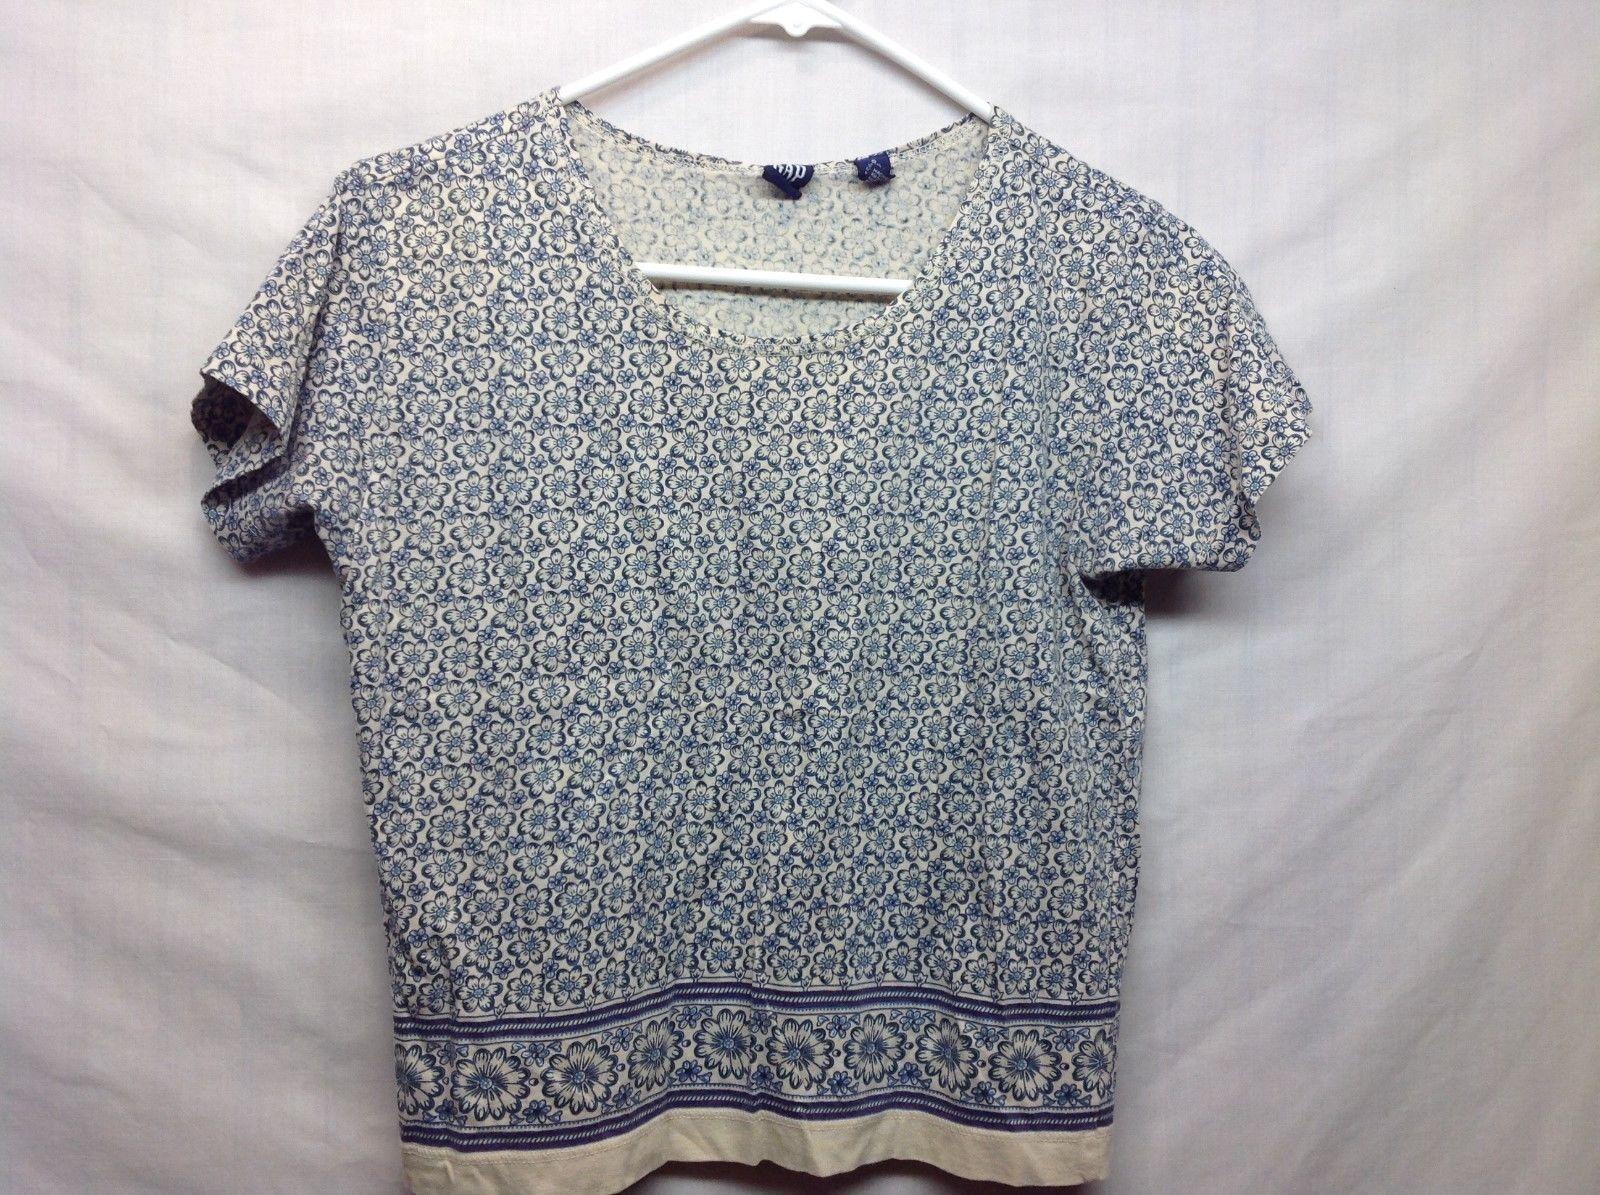 Ladies Cream w Blue Floral Print Scoop Neck Short Sleeve Shirt by GAP Sz S